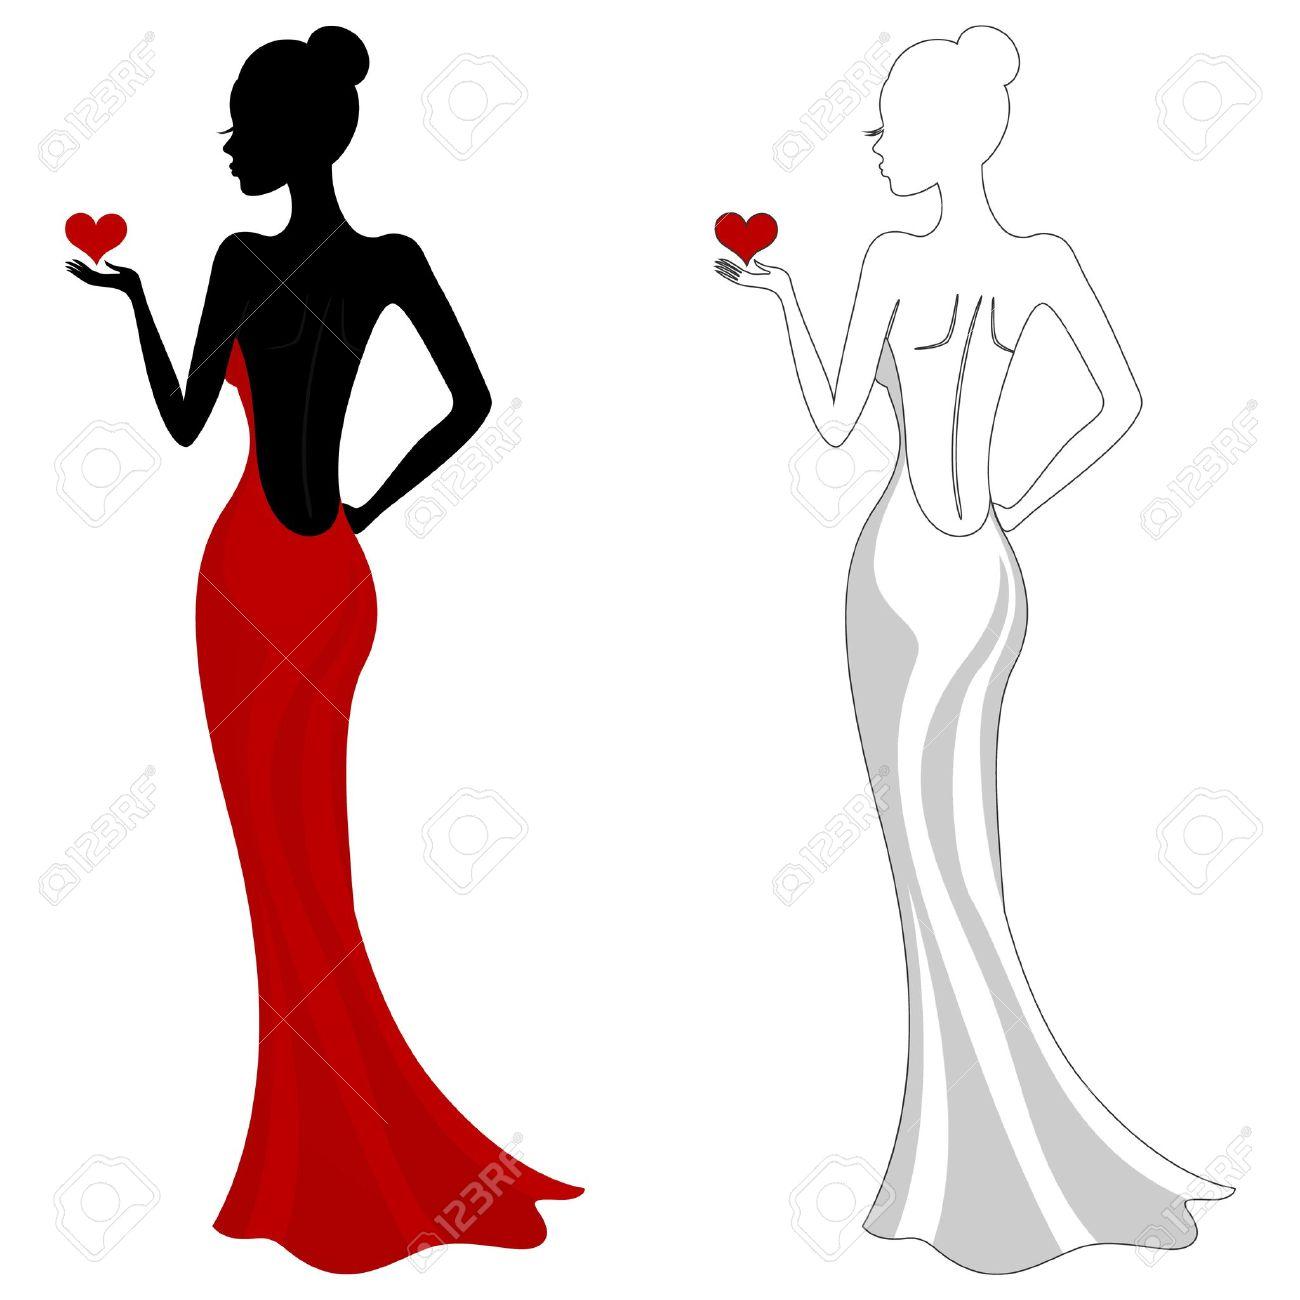 Bridesmaid Dress Silhouette Clip Art.